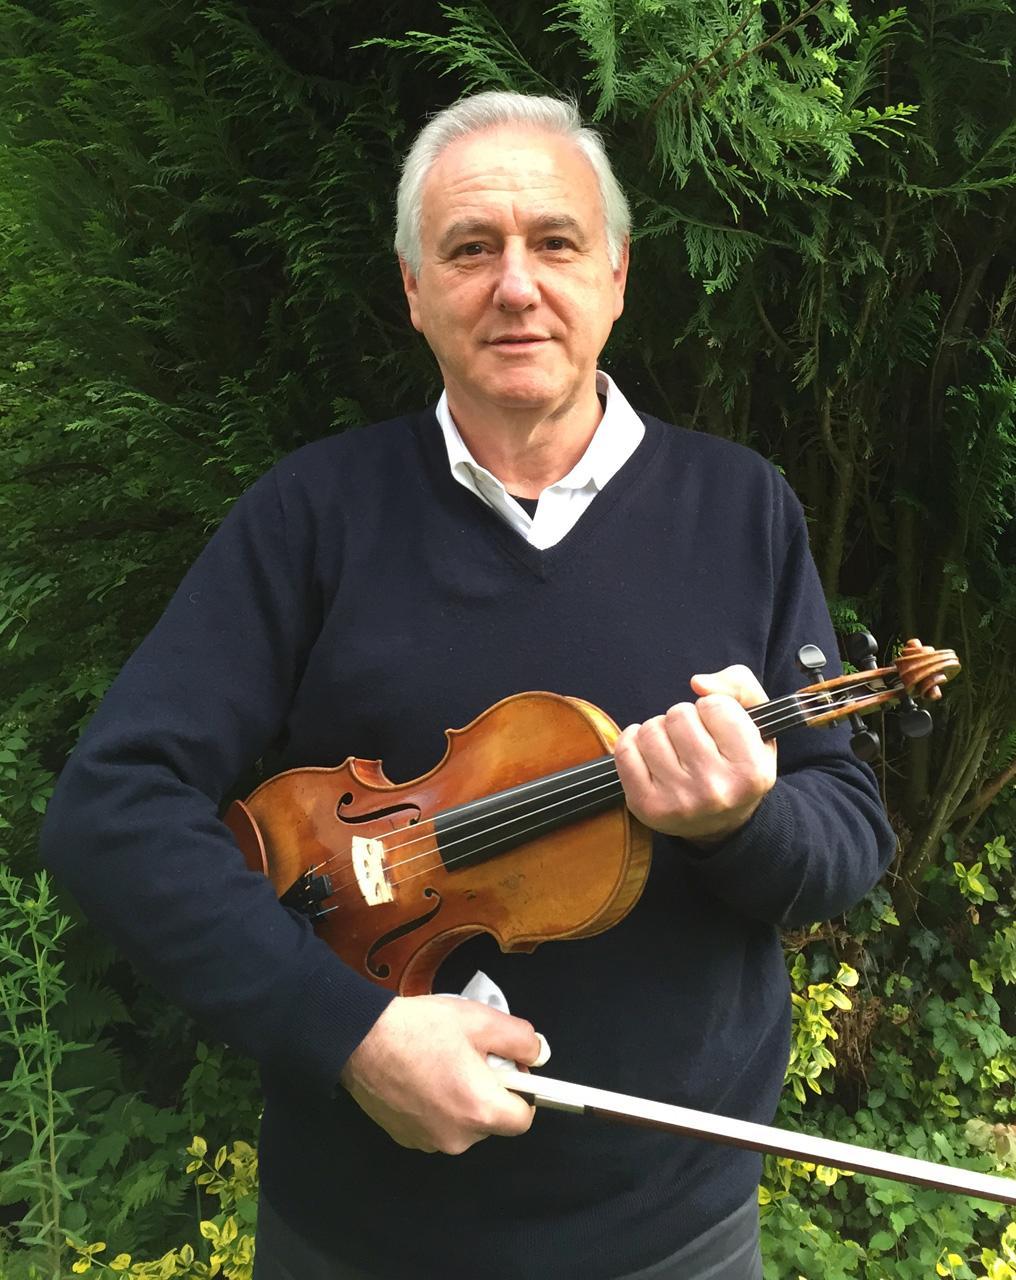 Konzertmeister Peter Rosenberg sagt mit Mozart adieu